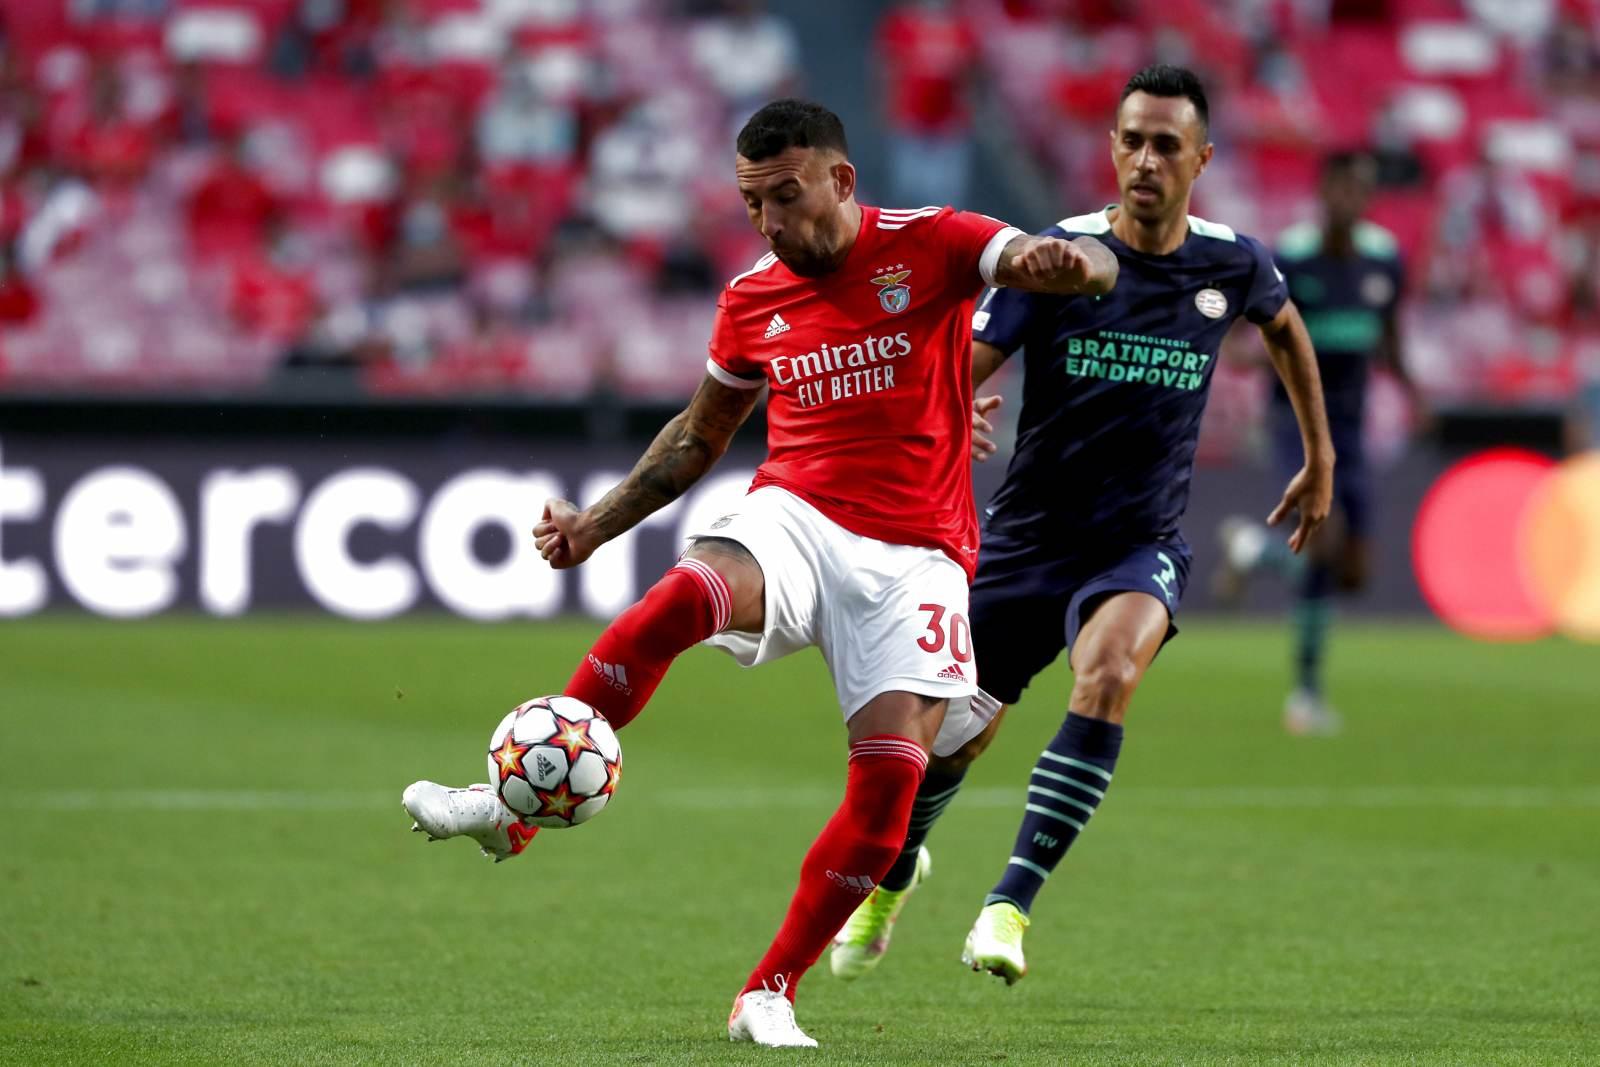 Отаменди: «Бенфика» потеряла два очка в матче с «Динамо»